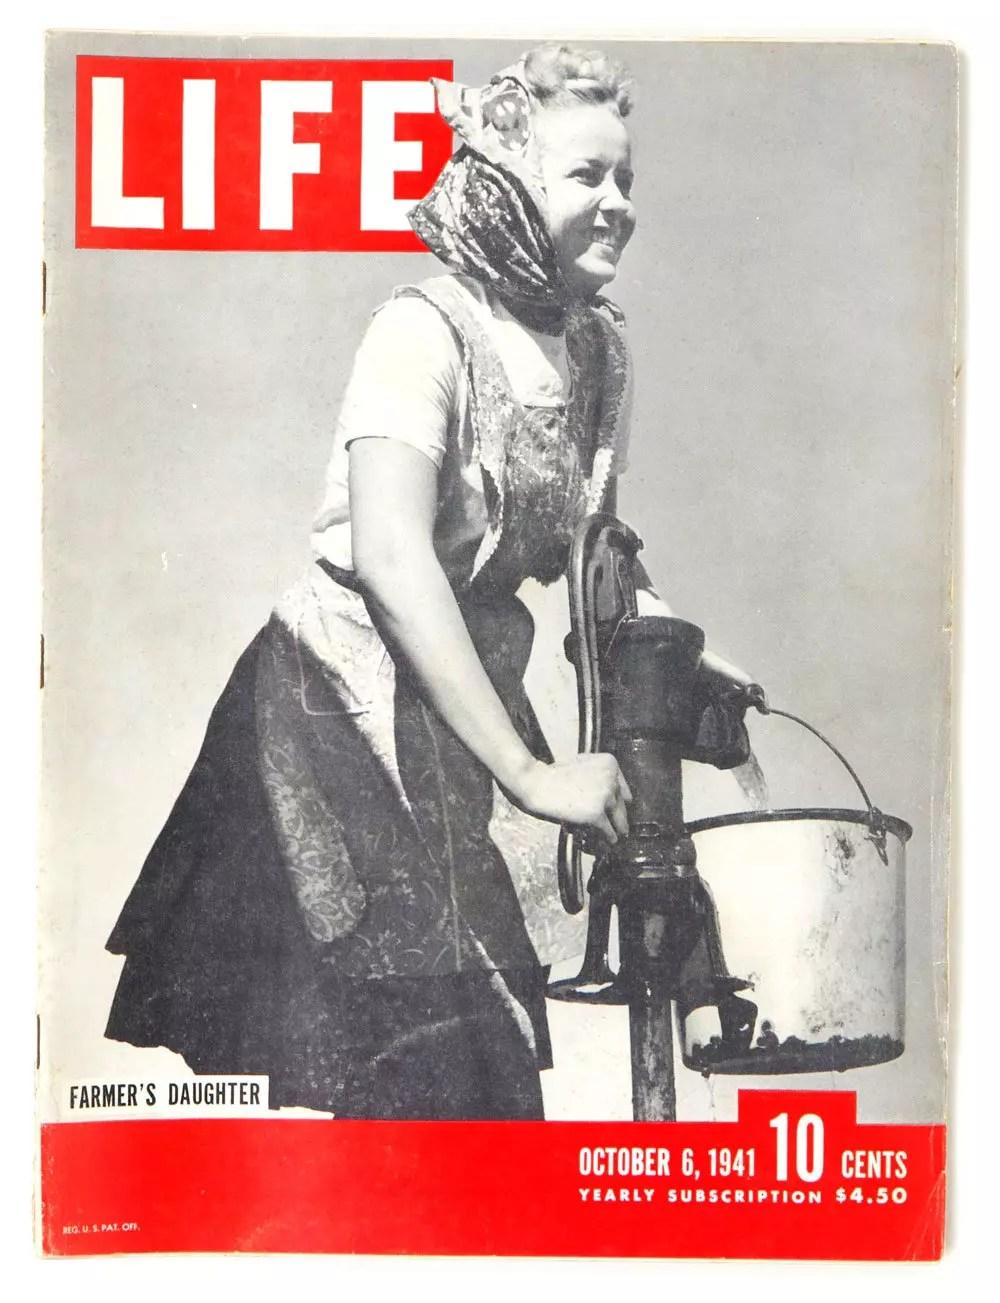 LIFE Magazine 1941 October 6 Farmer's Daughter